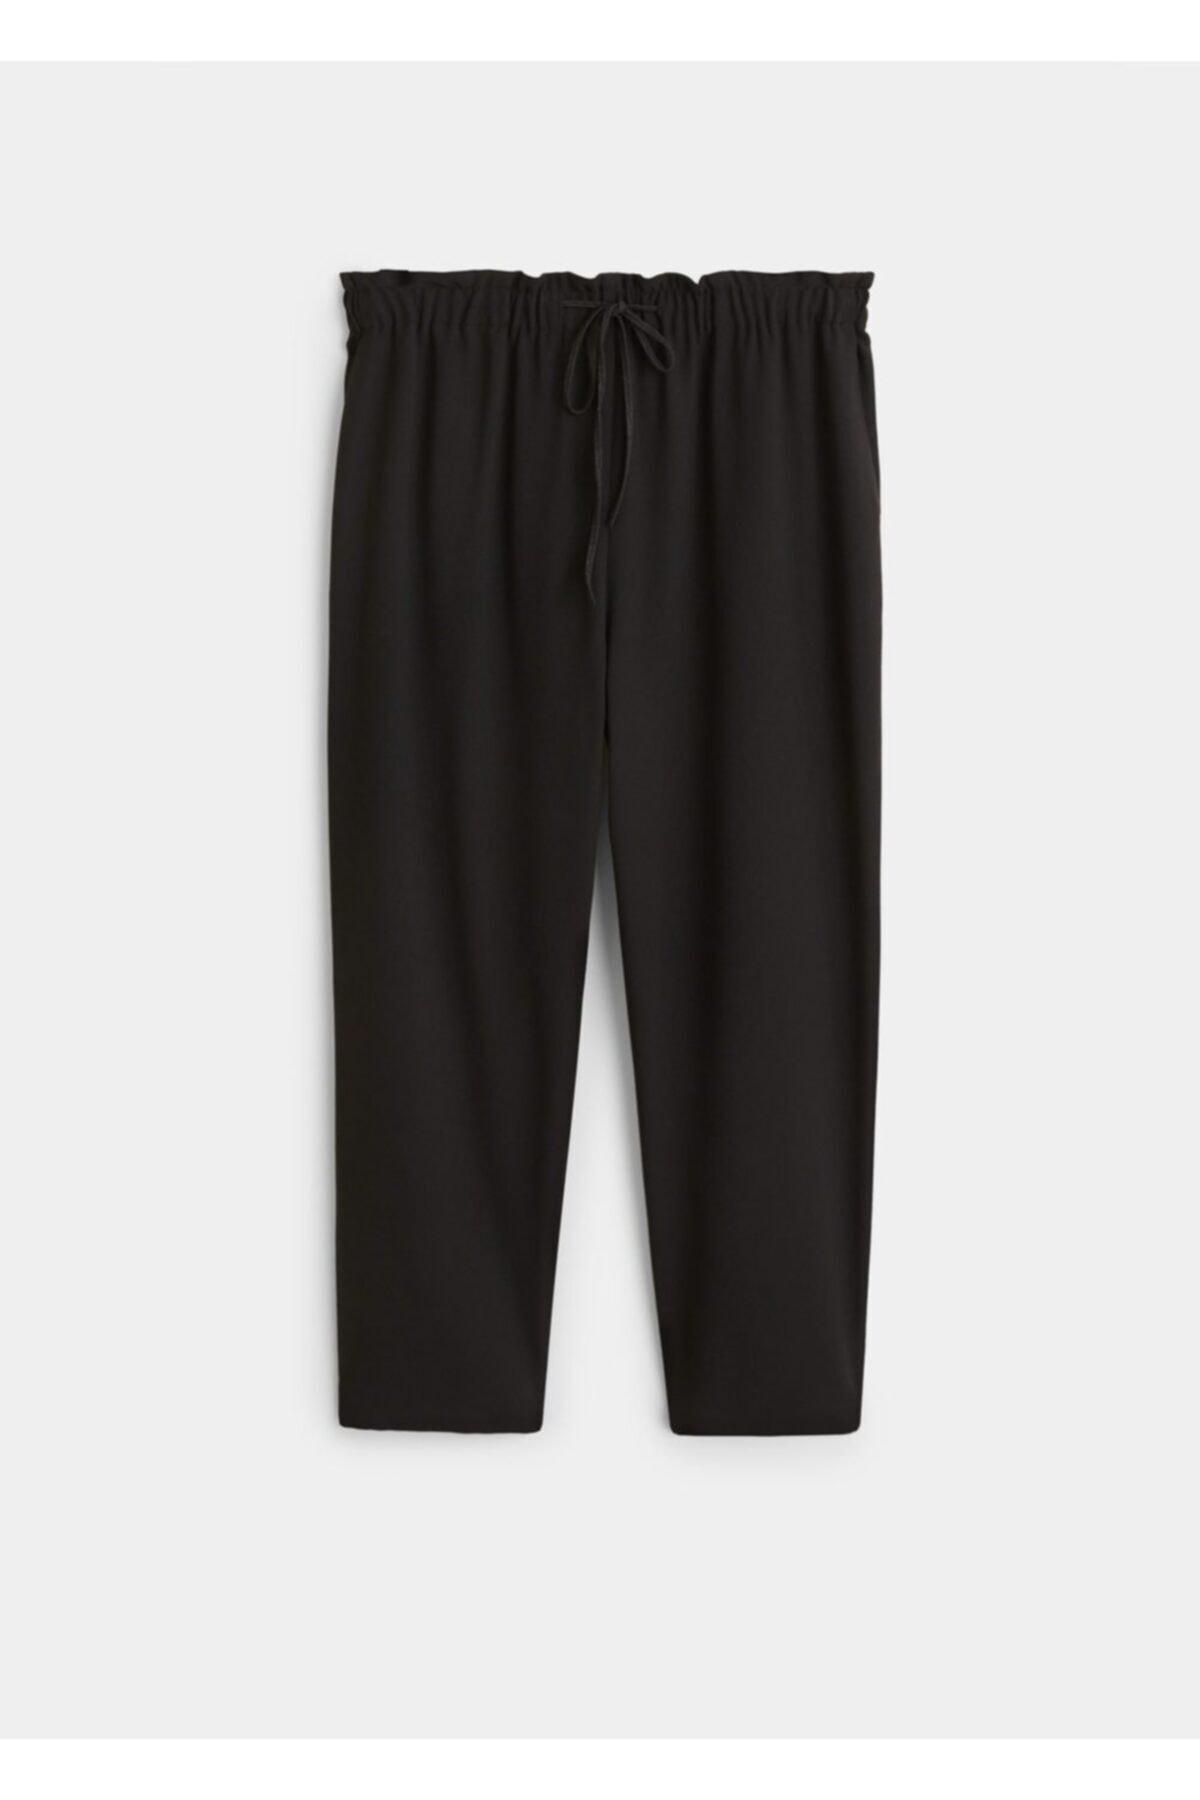 Violeta by MANGO Kadın Siyah Beli Elastik Pantolon 61110630 1